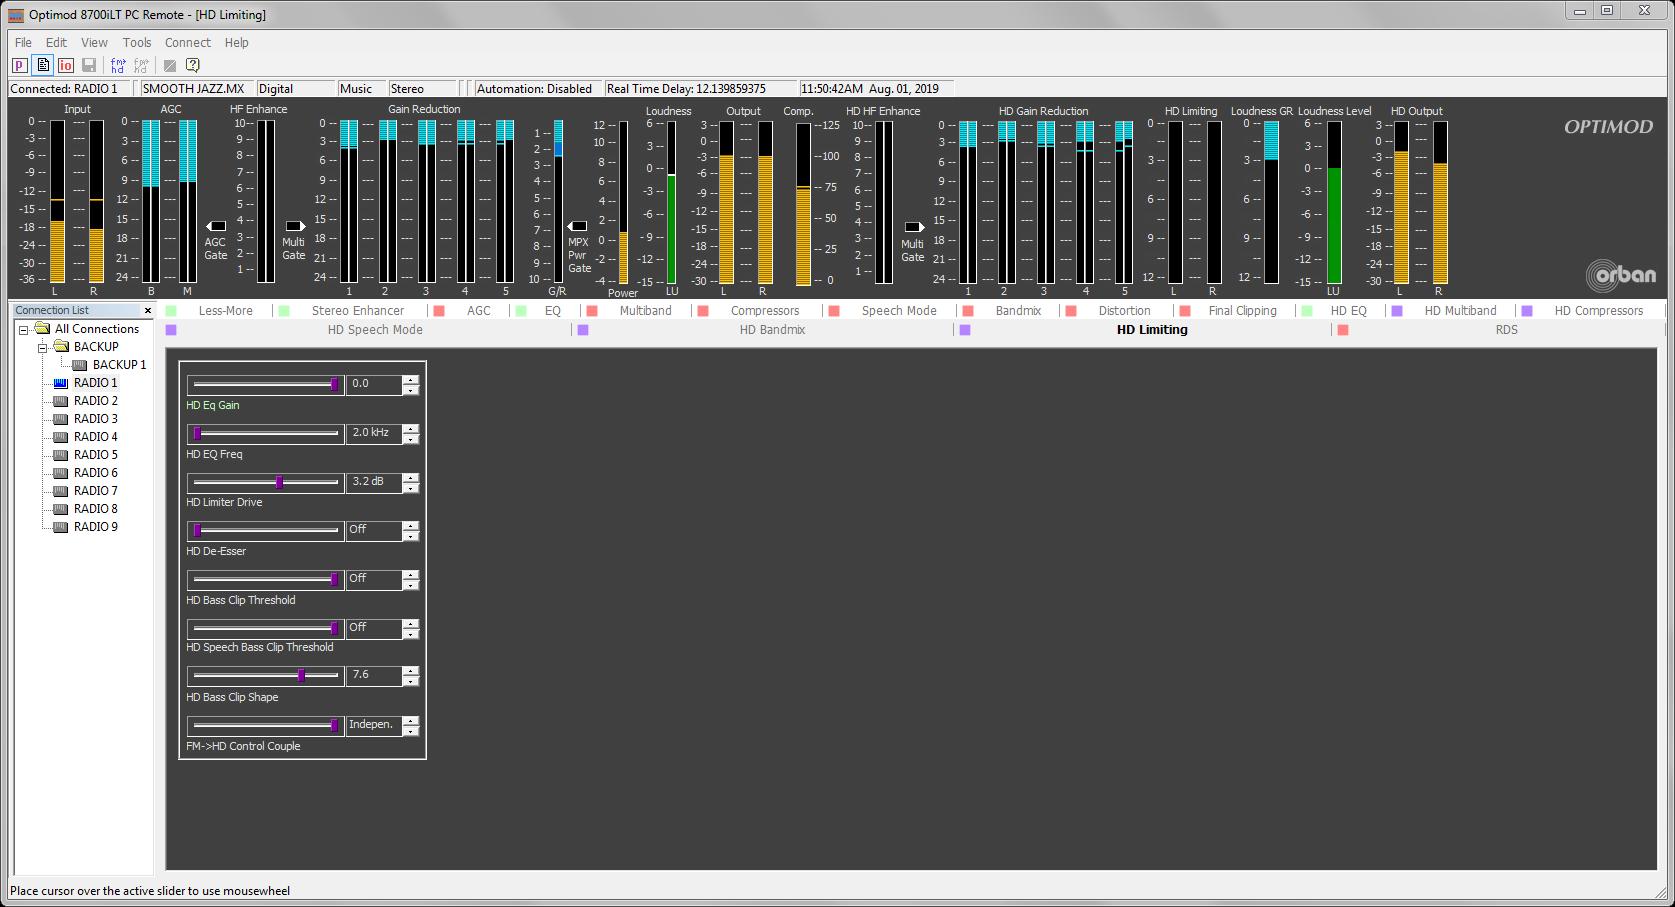 Remote Control Software for OPTIMOD 8700i LT Audio Processor